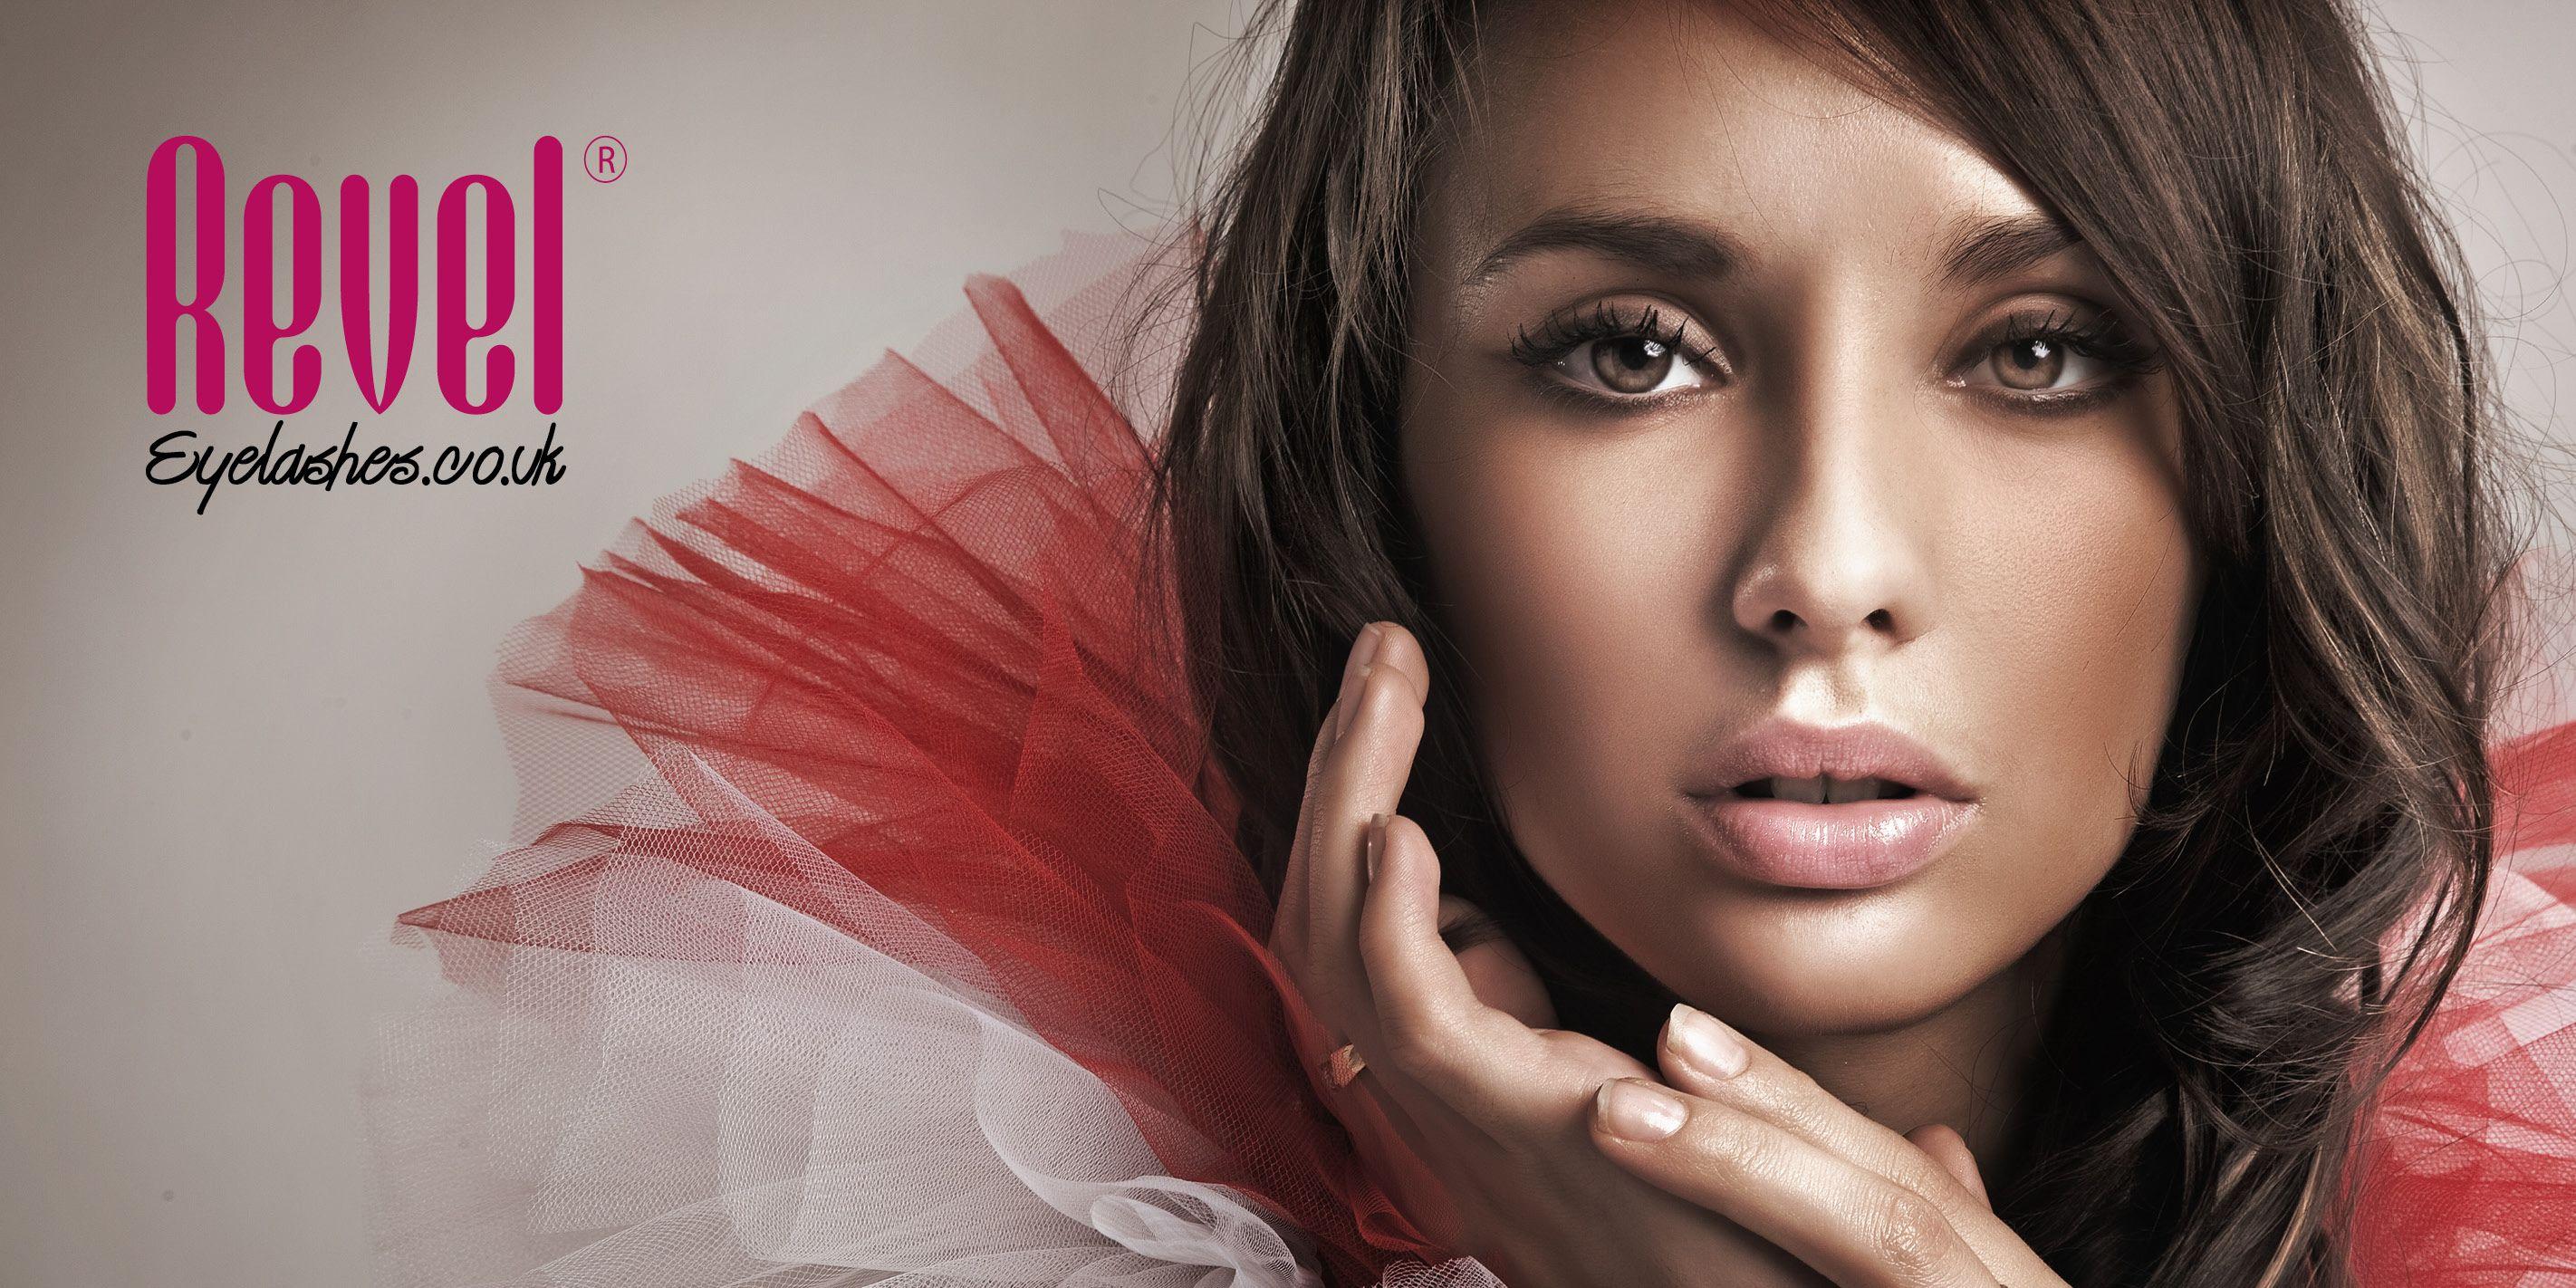 Revel Eyelashes are very versatile, you can wear them for any occasion. Choose your style with Revel!  #revel #natural #humanhair #lash #lashes #falsies #falselashes  #fakelashes #mua #promua #makeupartist #promakeupartist #proartist #artist #makeup #instabeauty #instalash #beauty #motd #eotd #trendy #majorlashes #lashesfordays #nofilter #falllook #colorimpact #eyes #colorenhancing